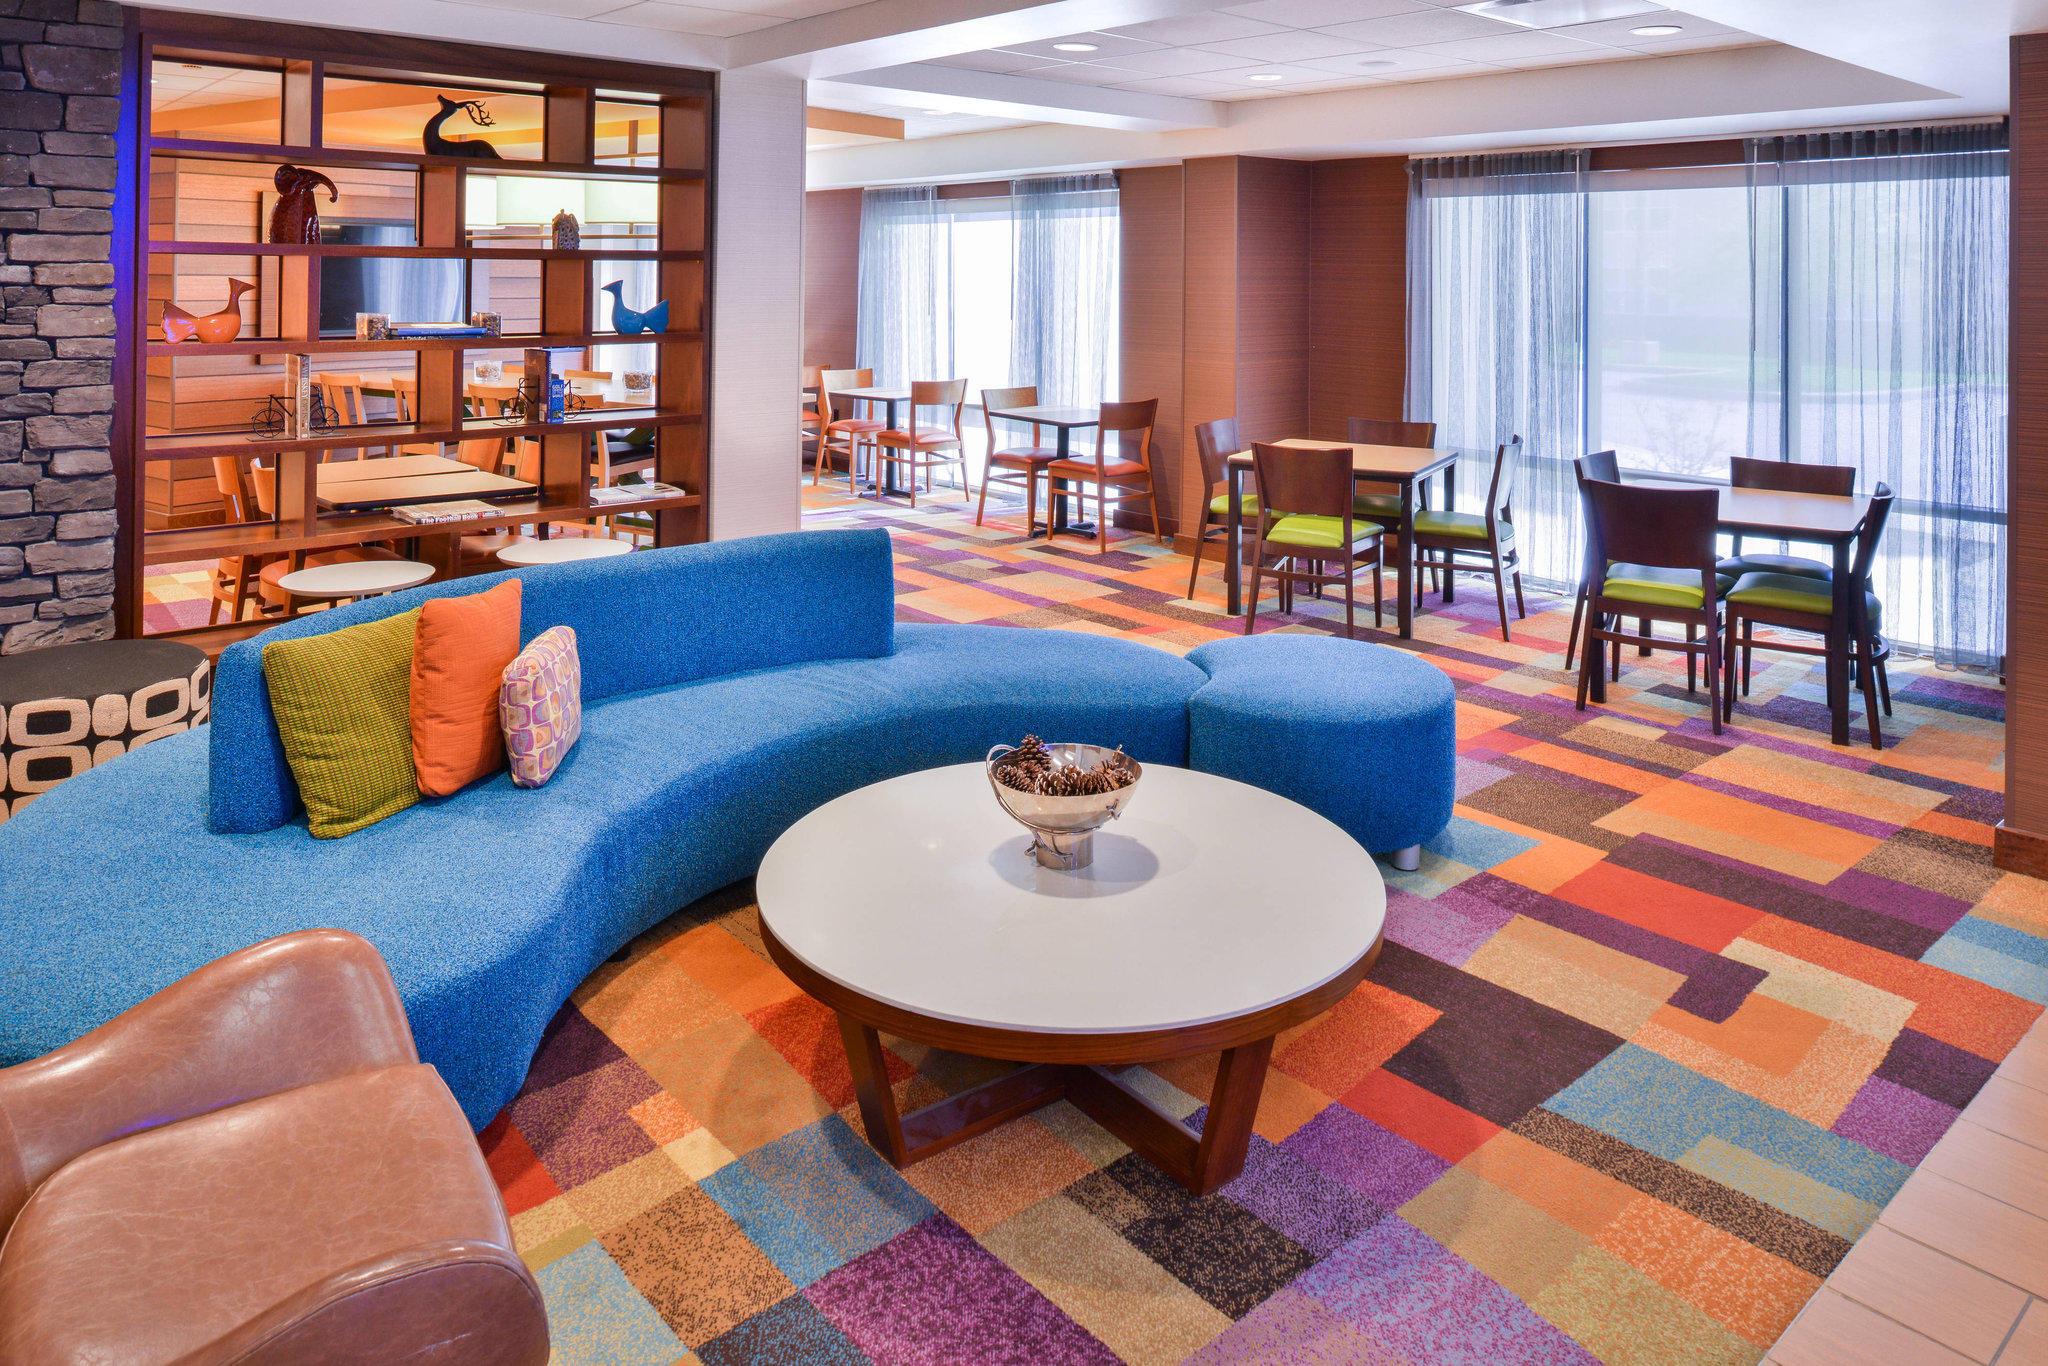 Fairfield Inn & Suites by Marriott Rochester West/Greece